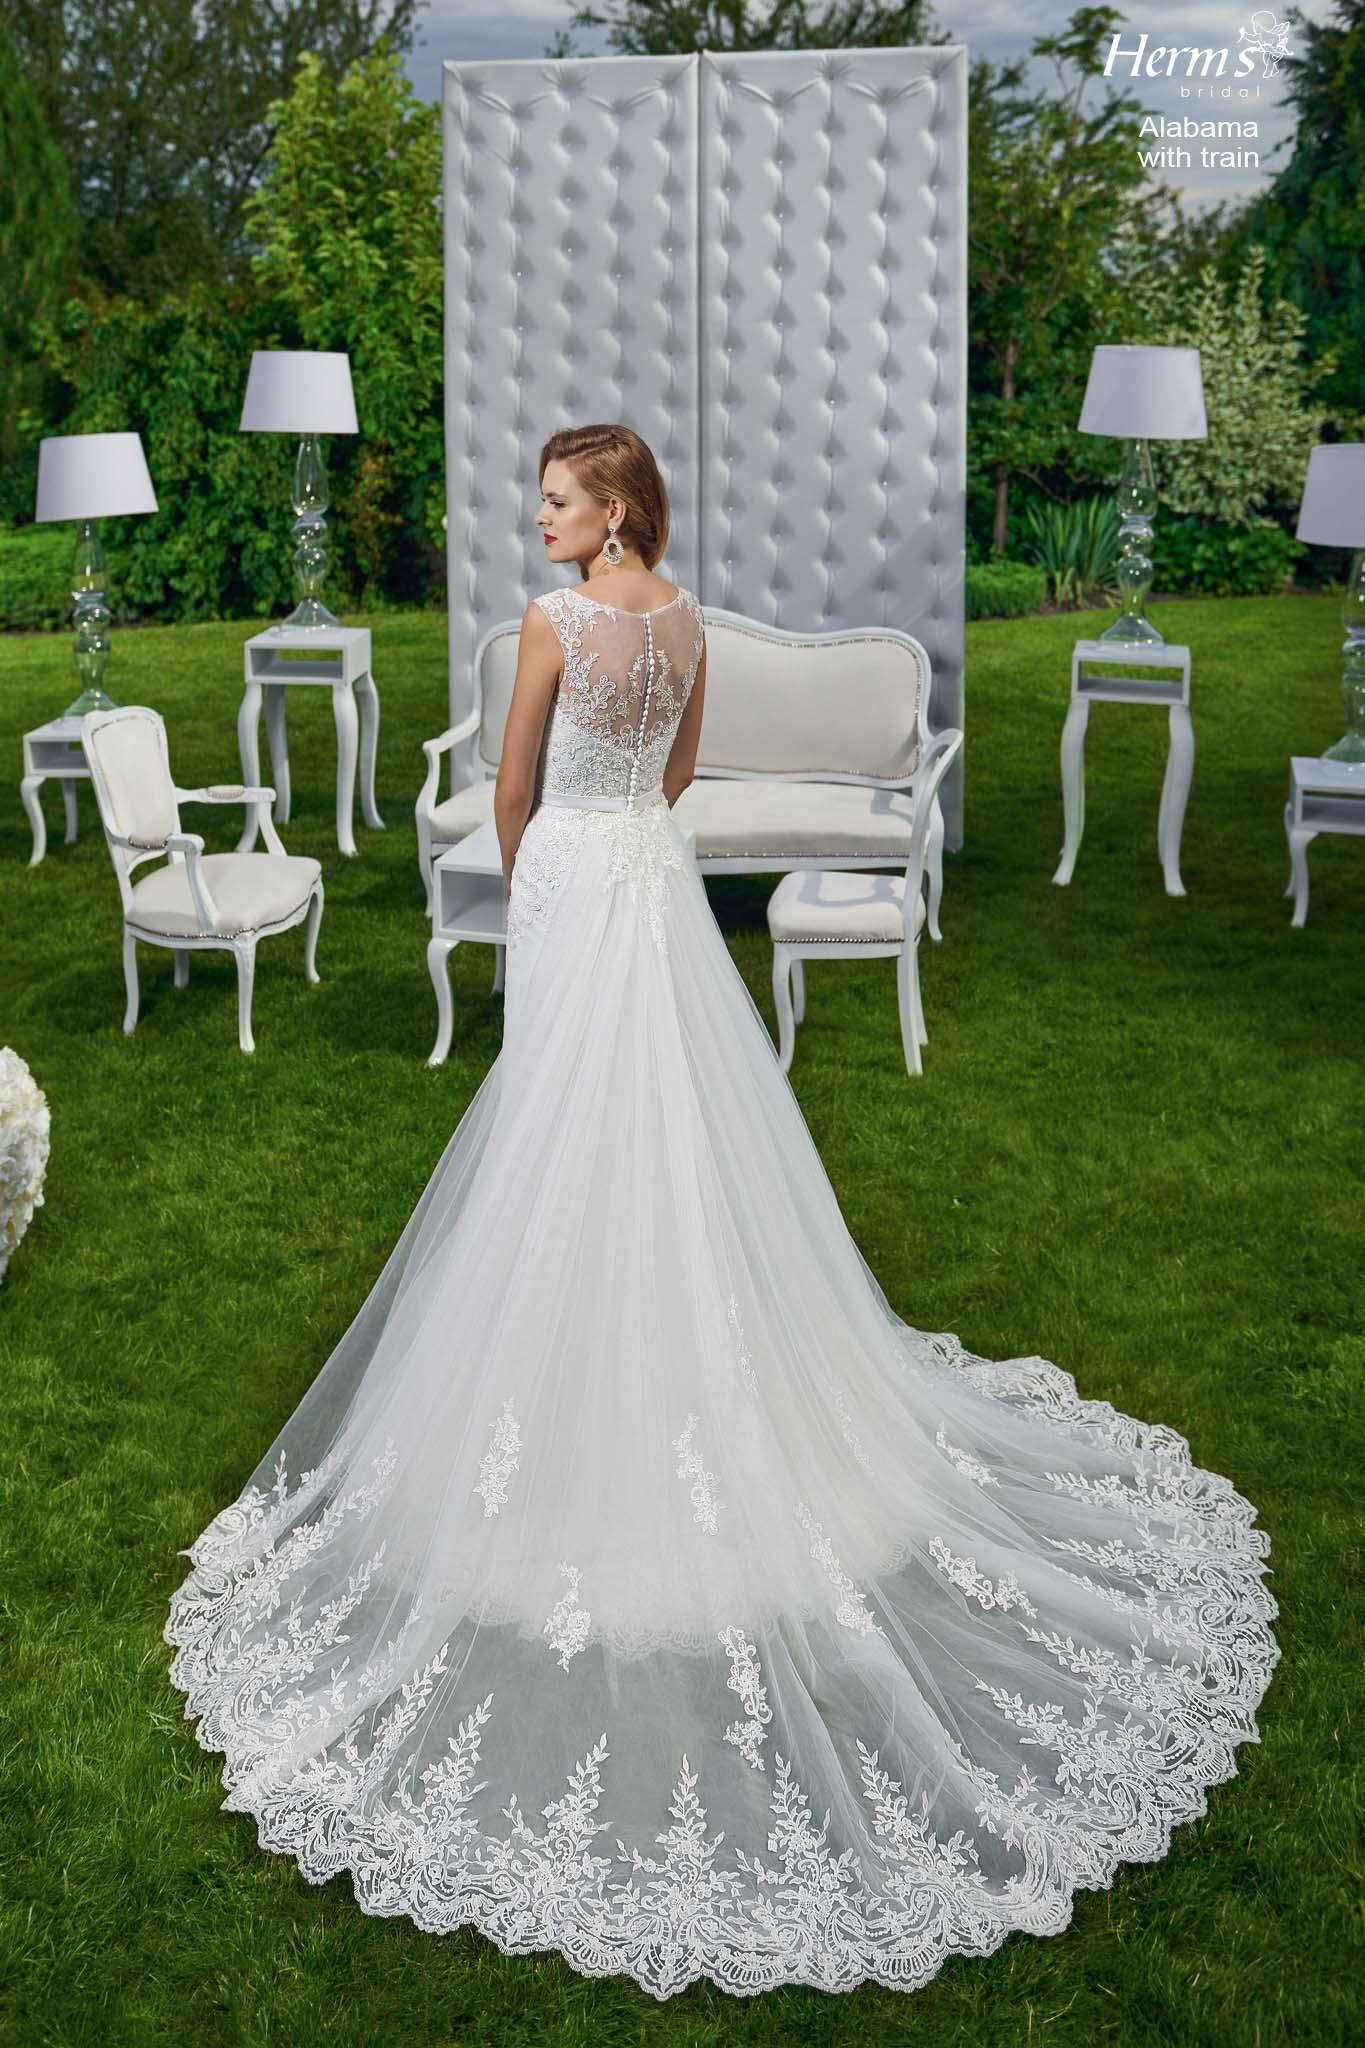 suknia ślubna Herm's Bridal Alabama